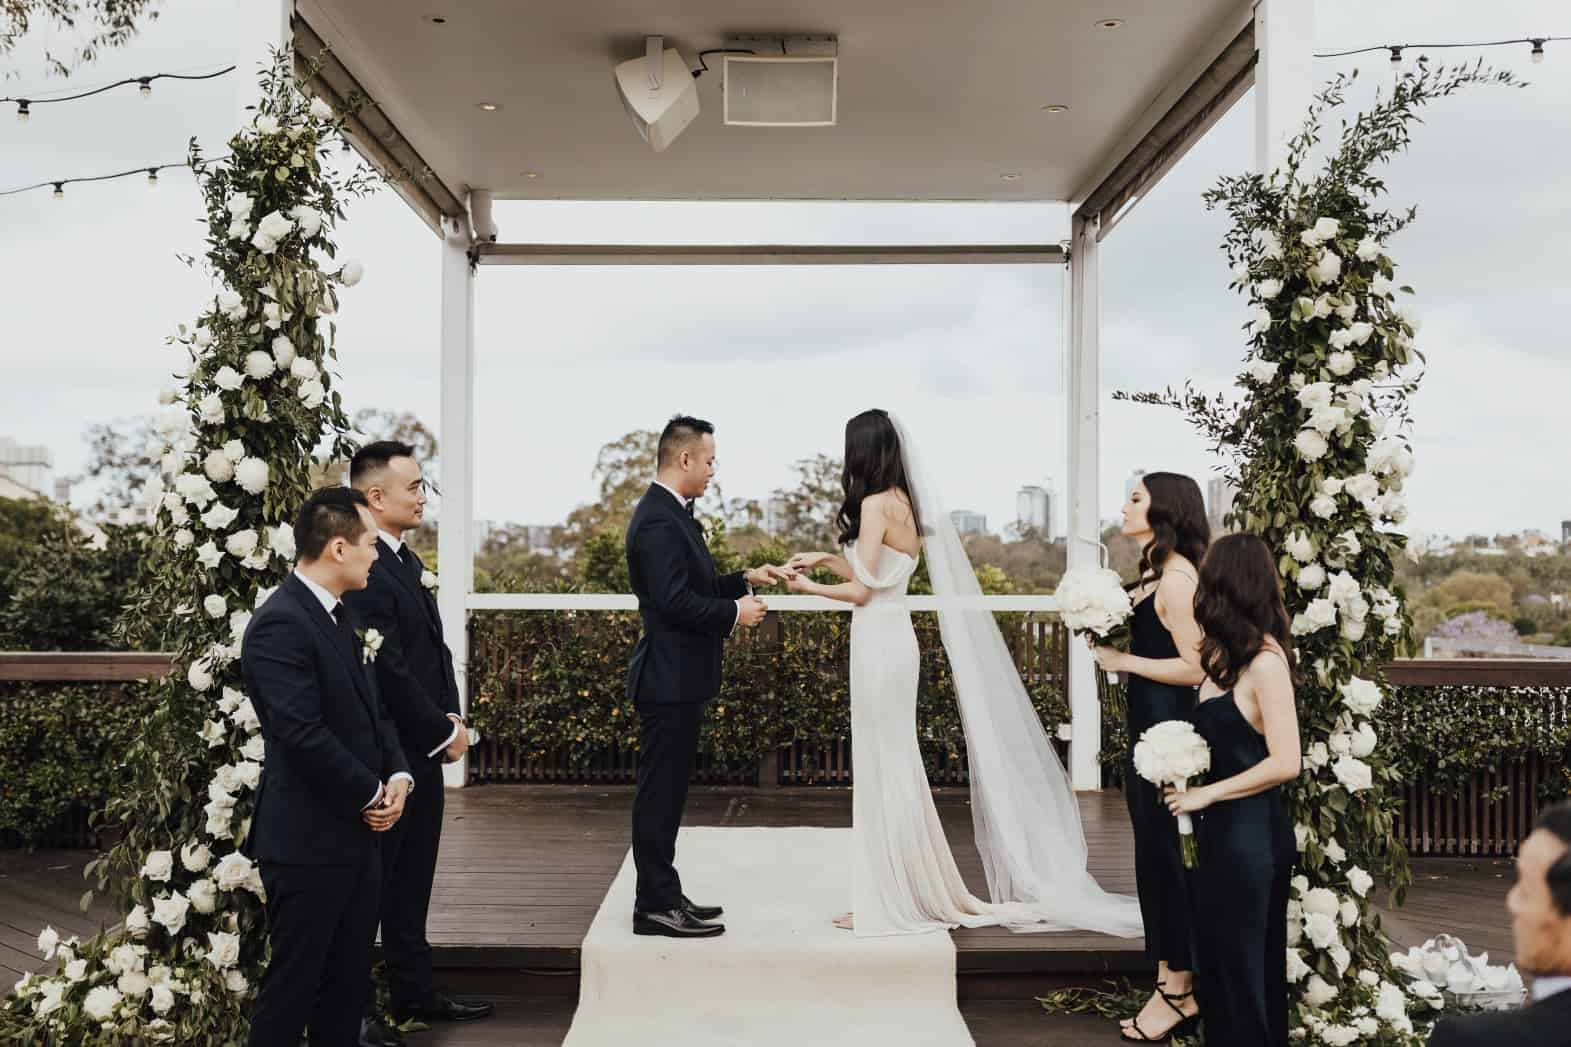 Victoria Park Wedding ceremony